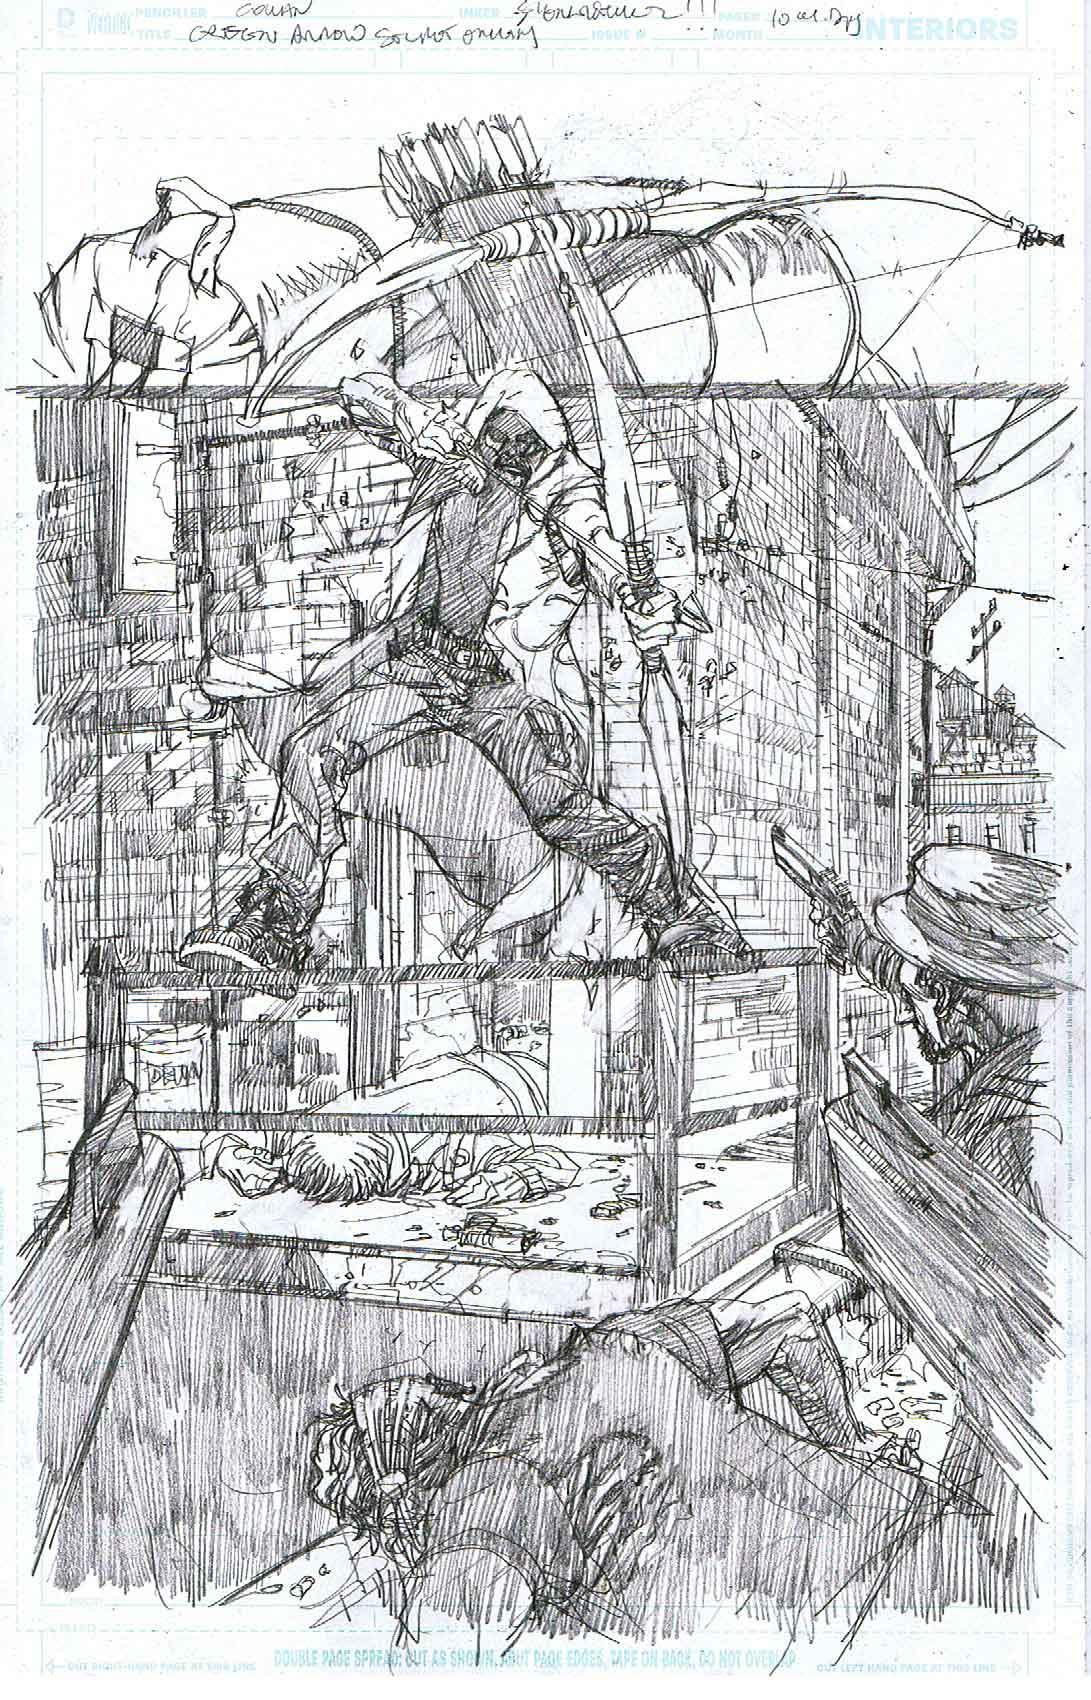 Green Arrow: Secret Origins - Page 10 - Pencils